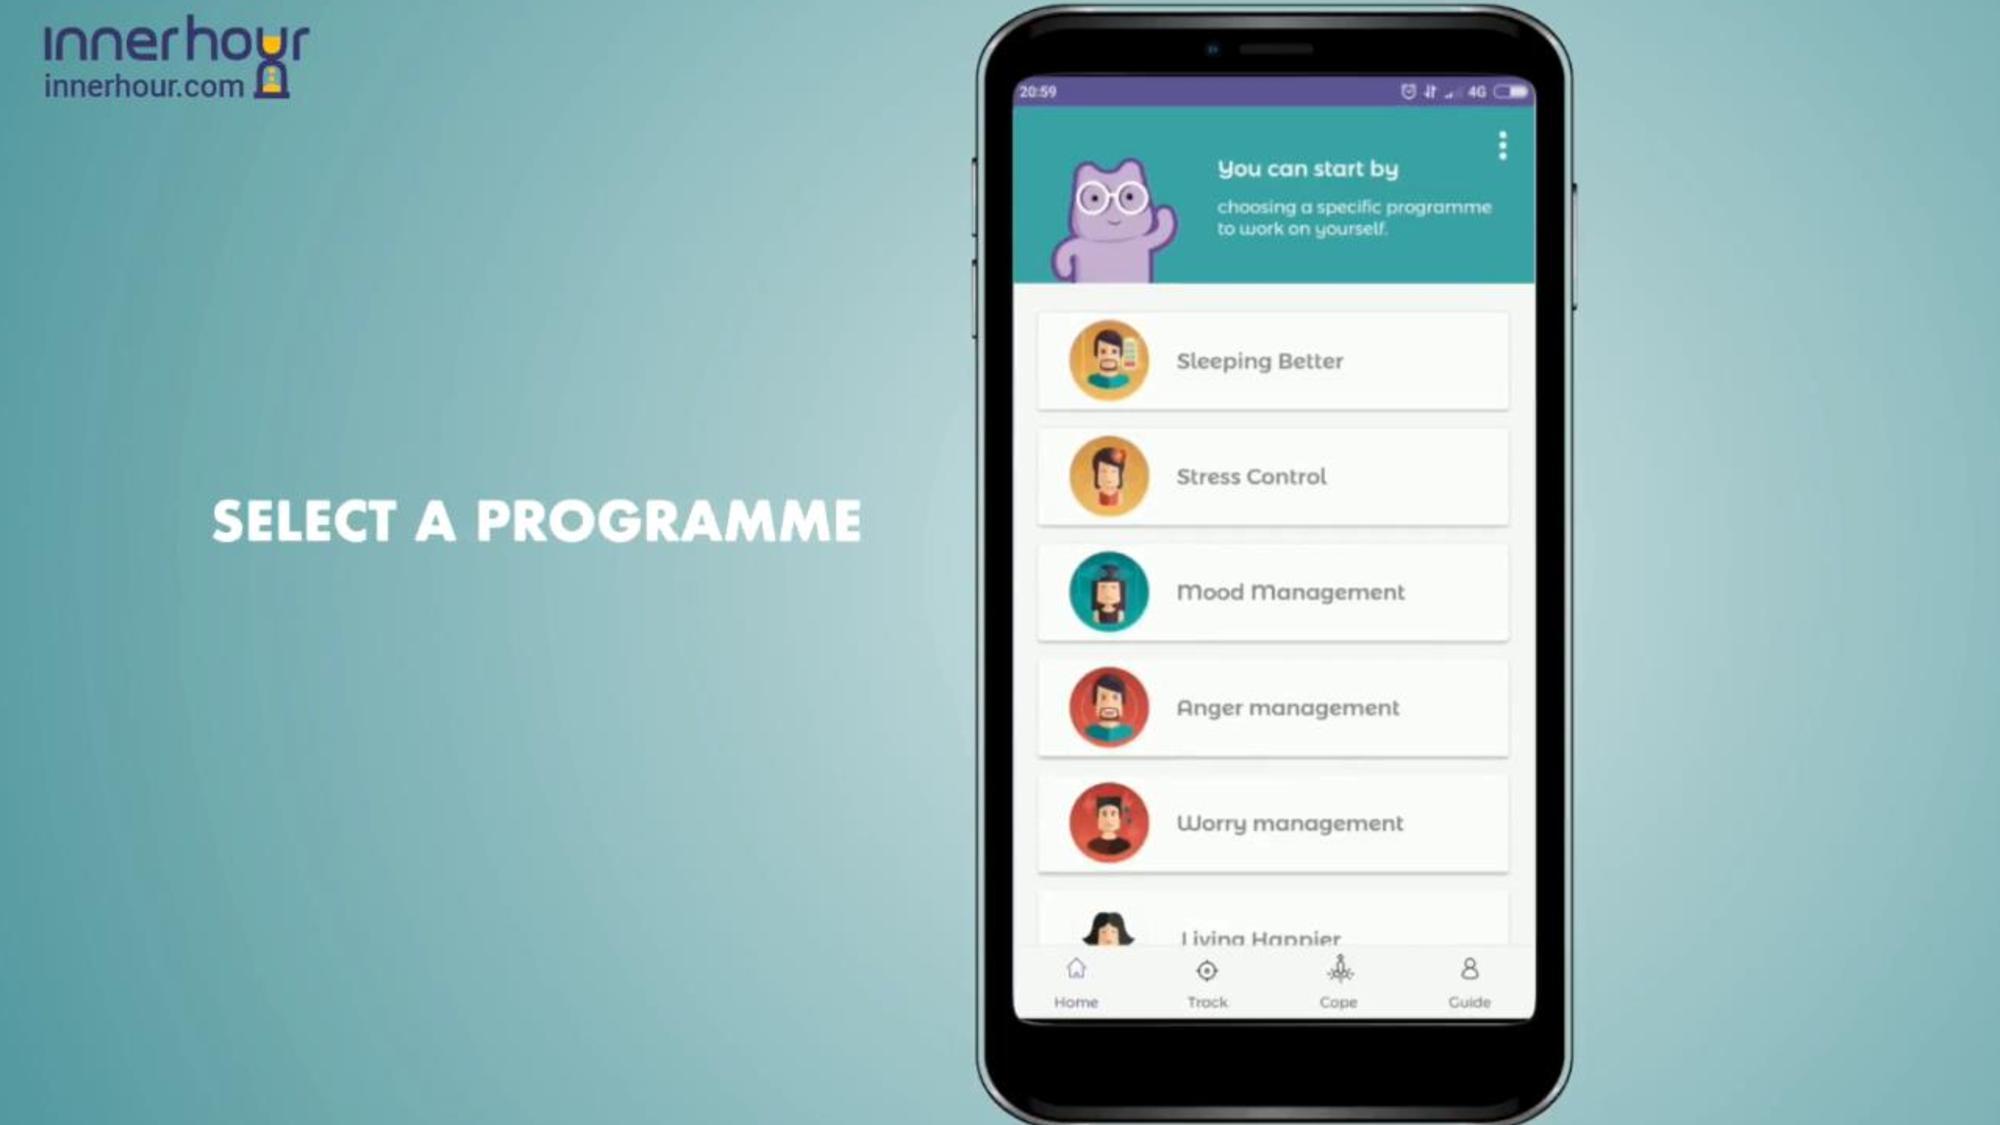 InnerHour select a programme screen